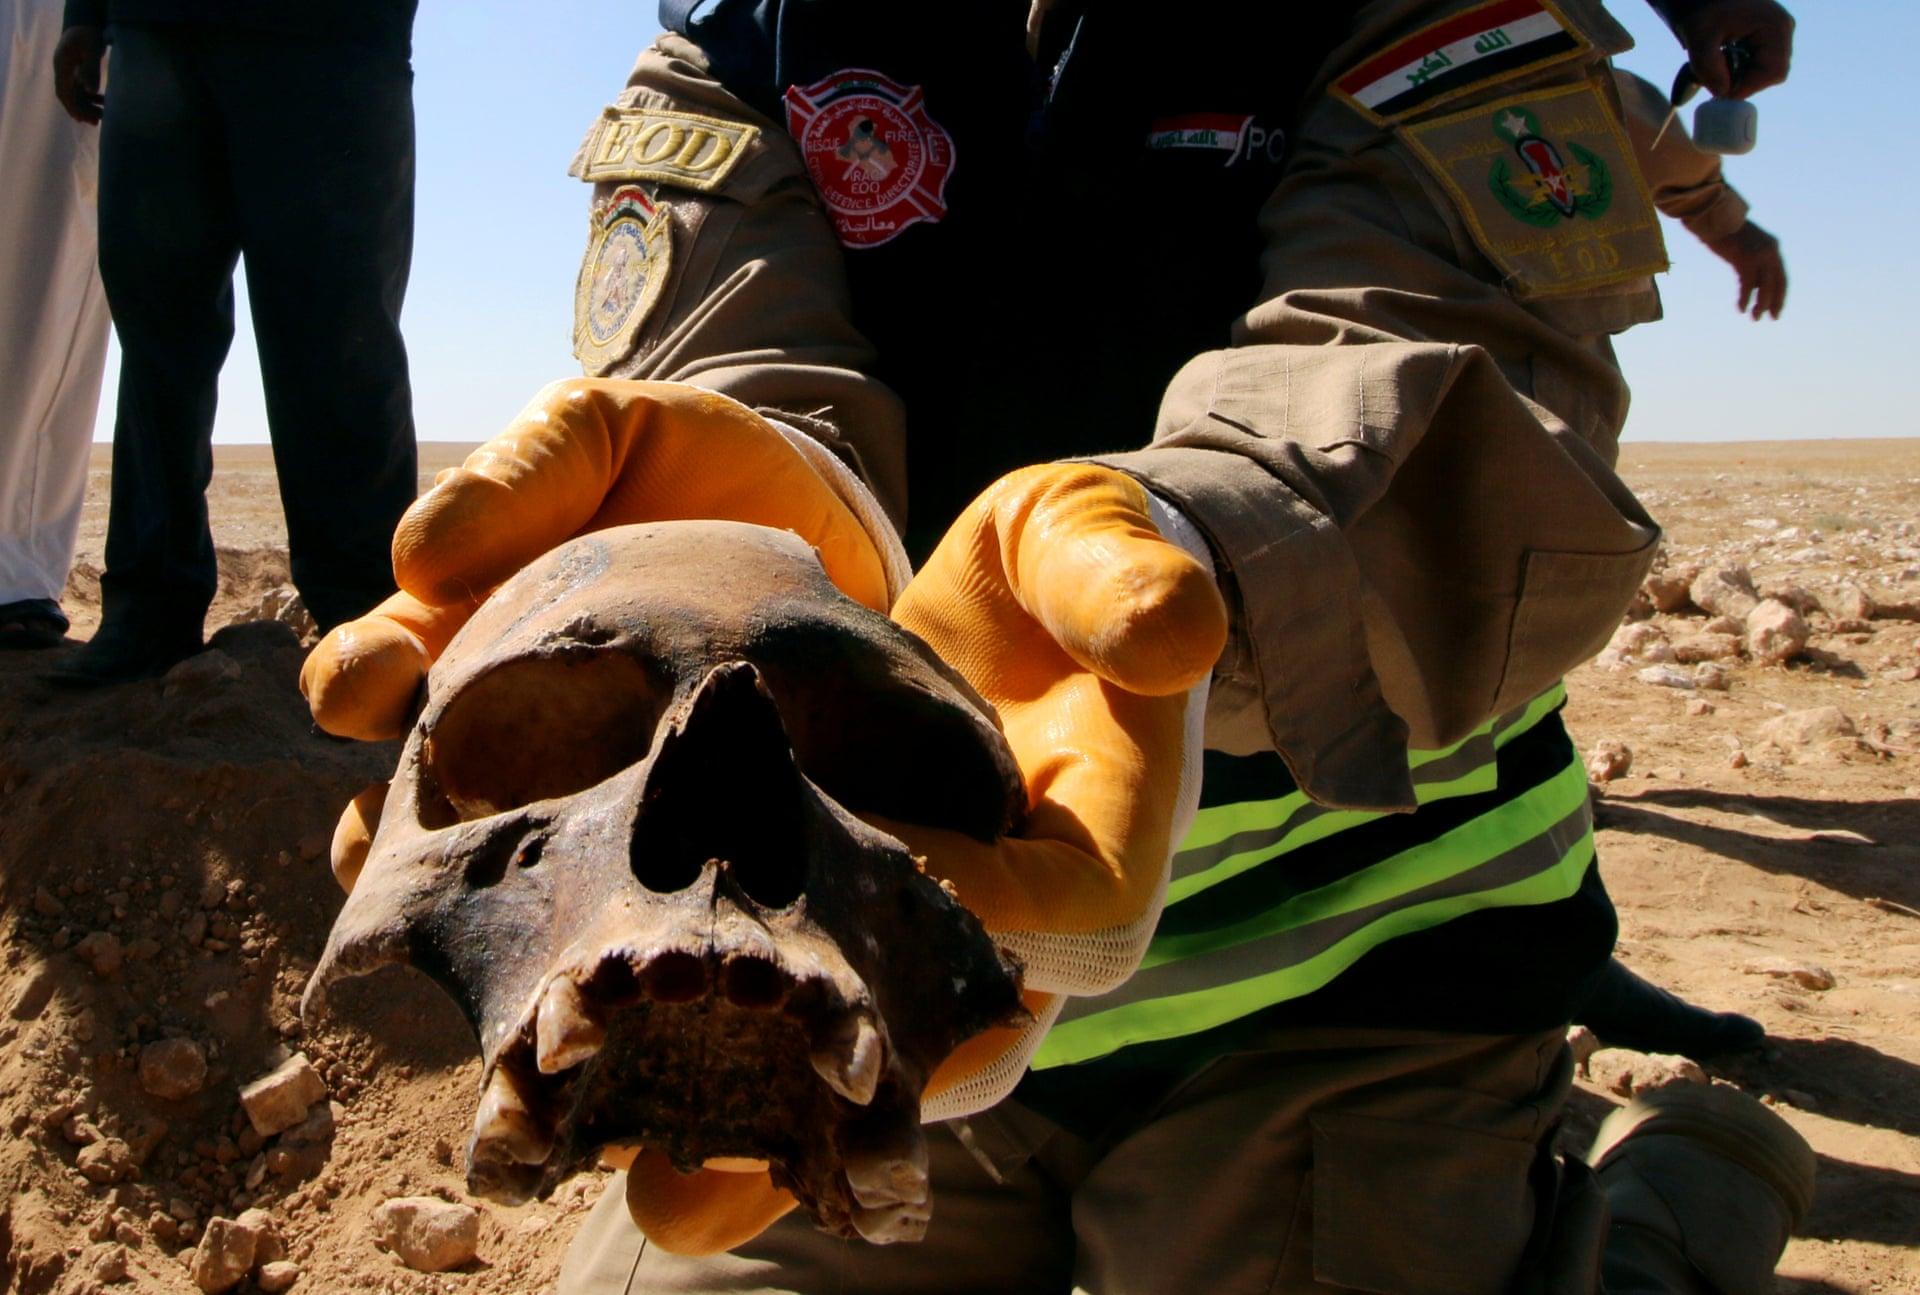 Essam al-Sudani/Reuters/Scanpix